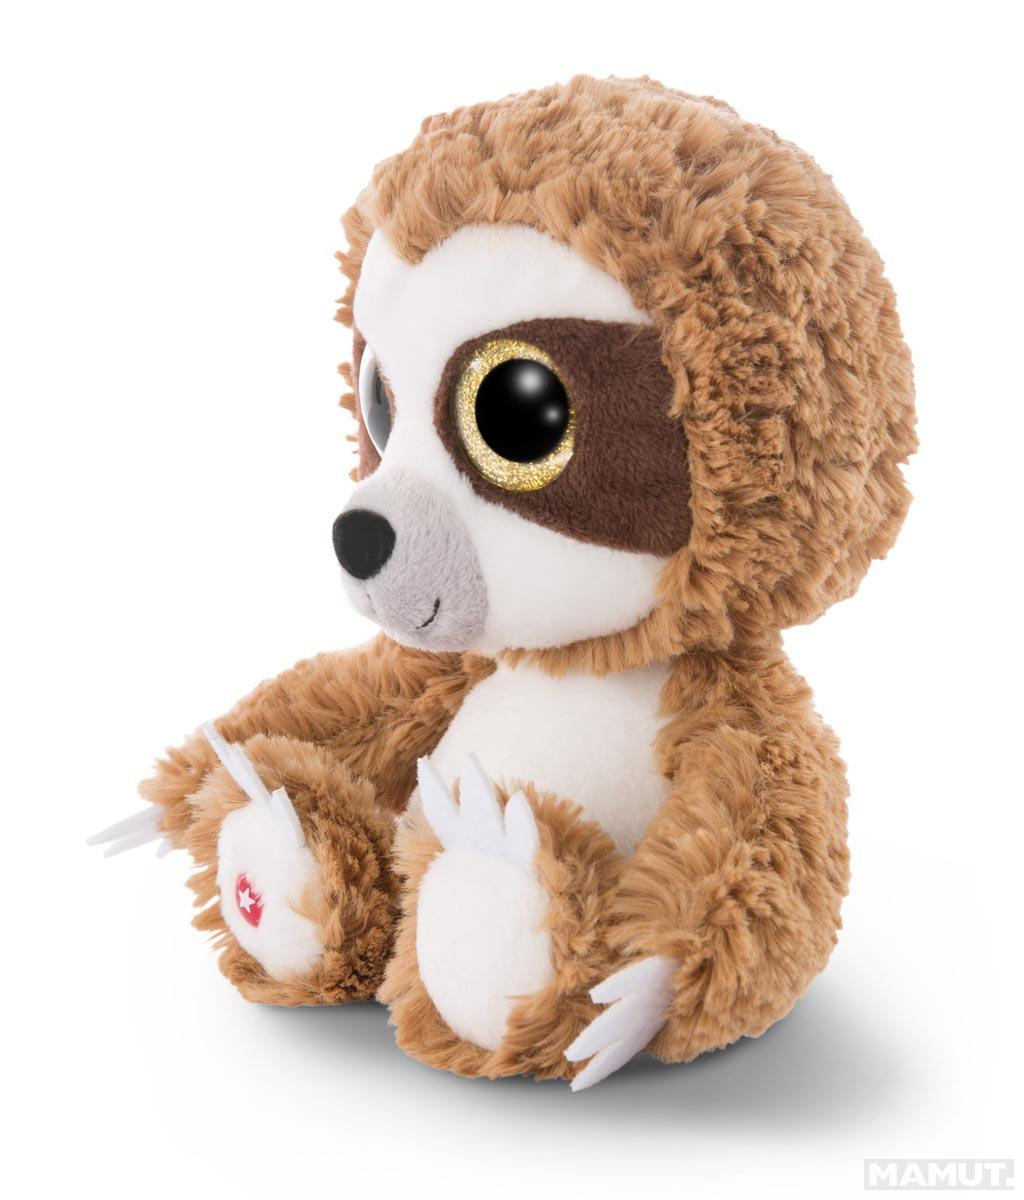 Plišana igračka GLUBSCHIS Sloth Heywood